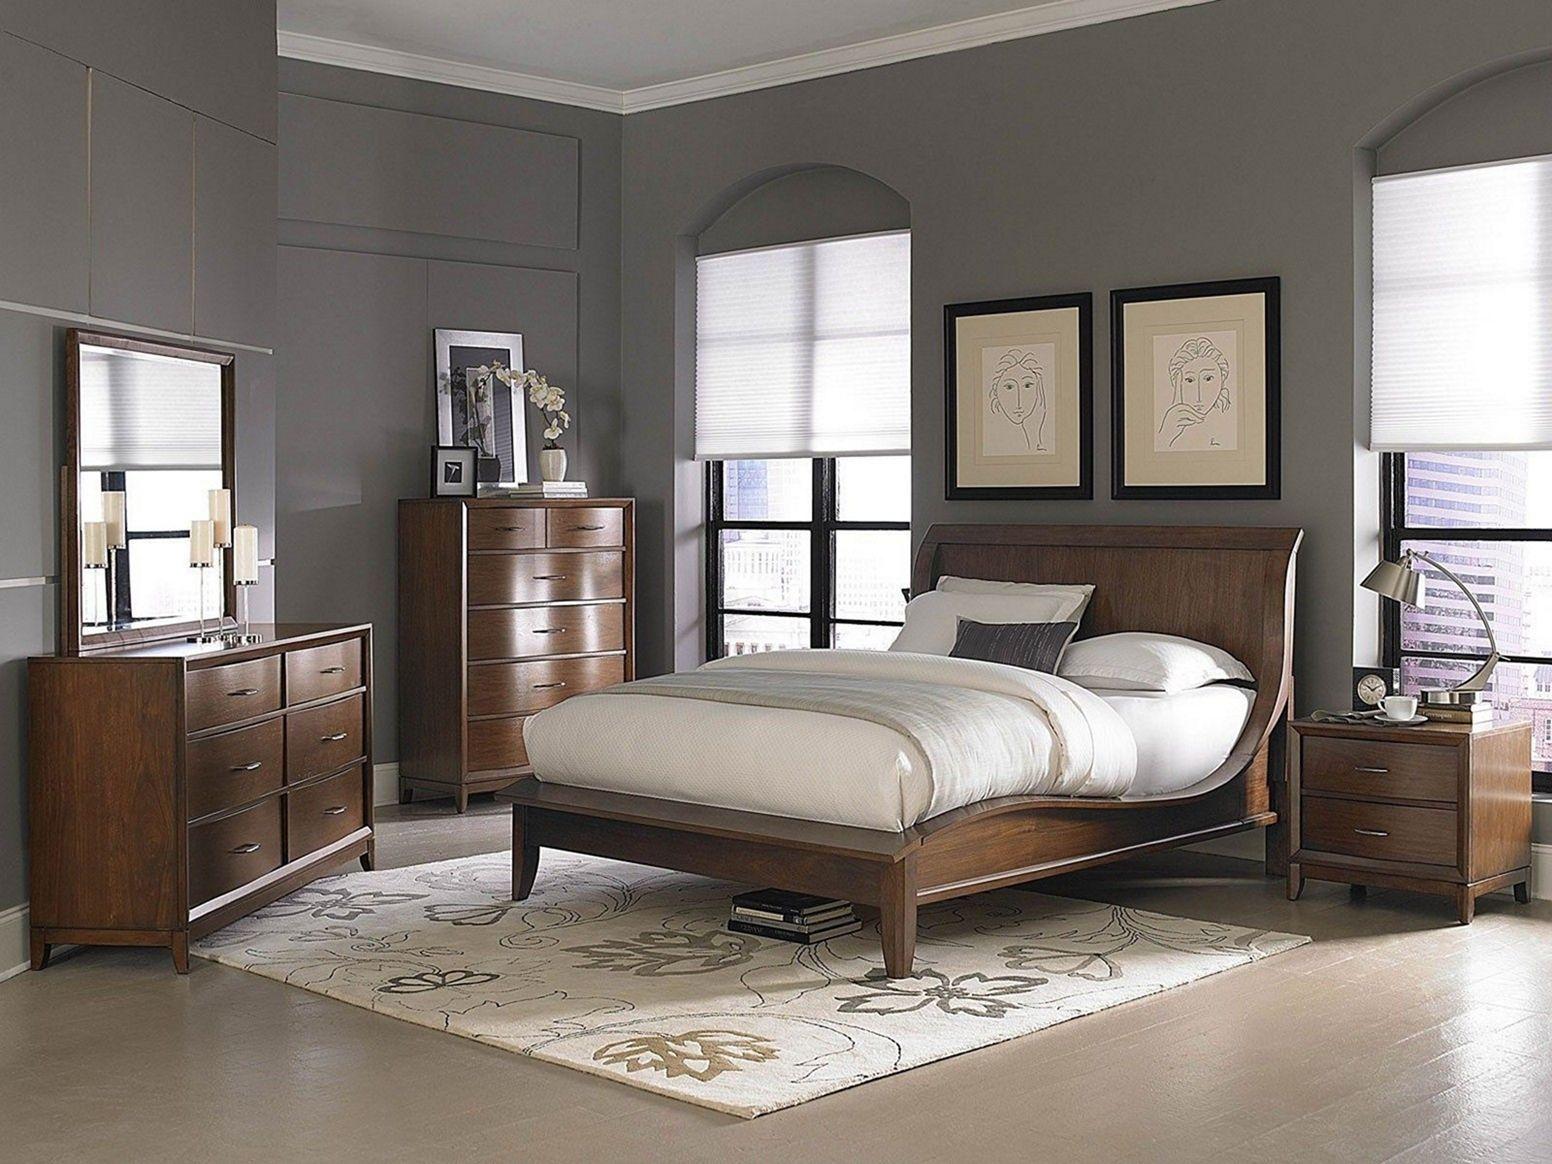 minimalist small master bedroom designs anda decorations you